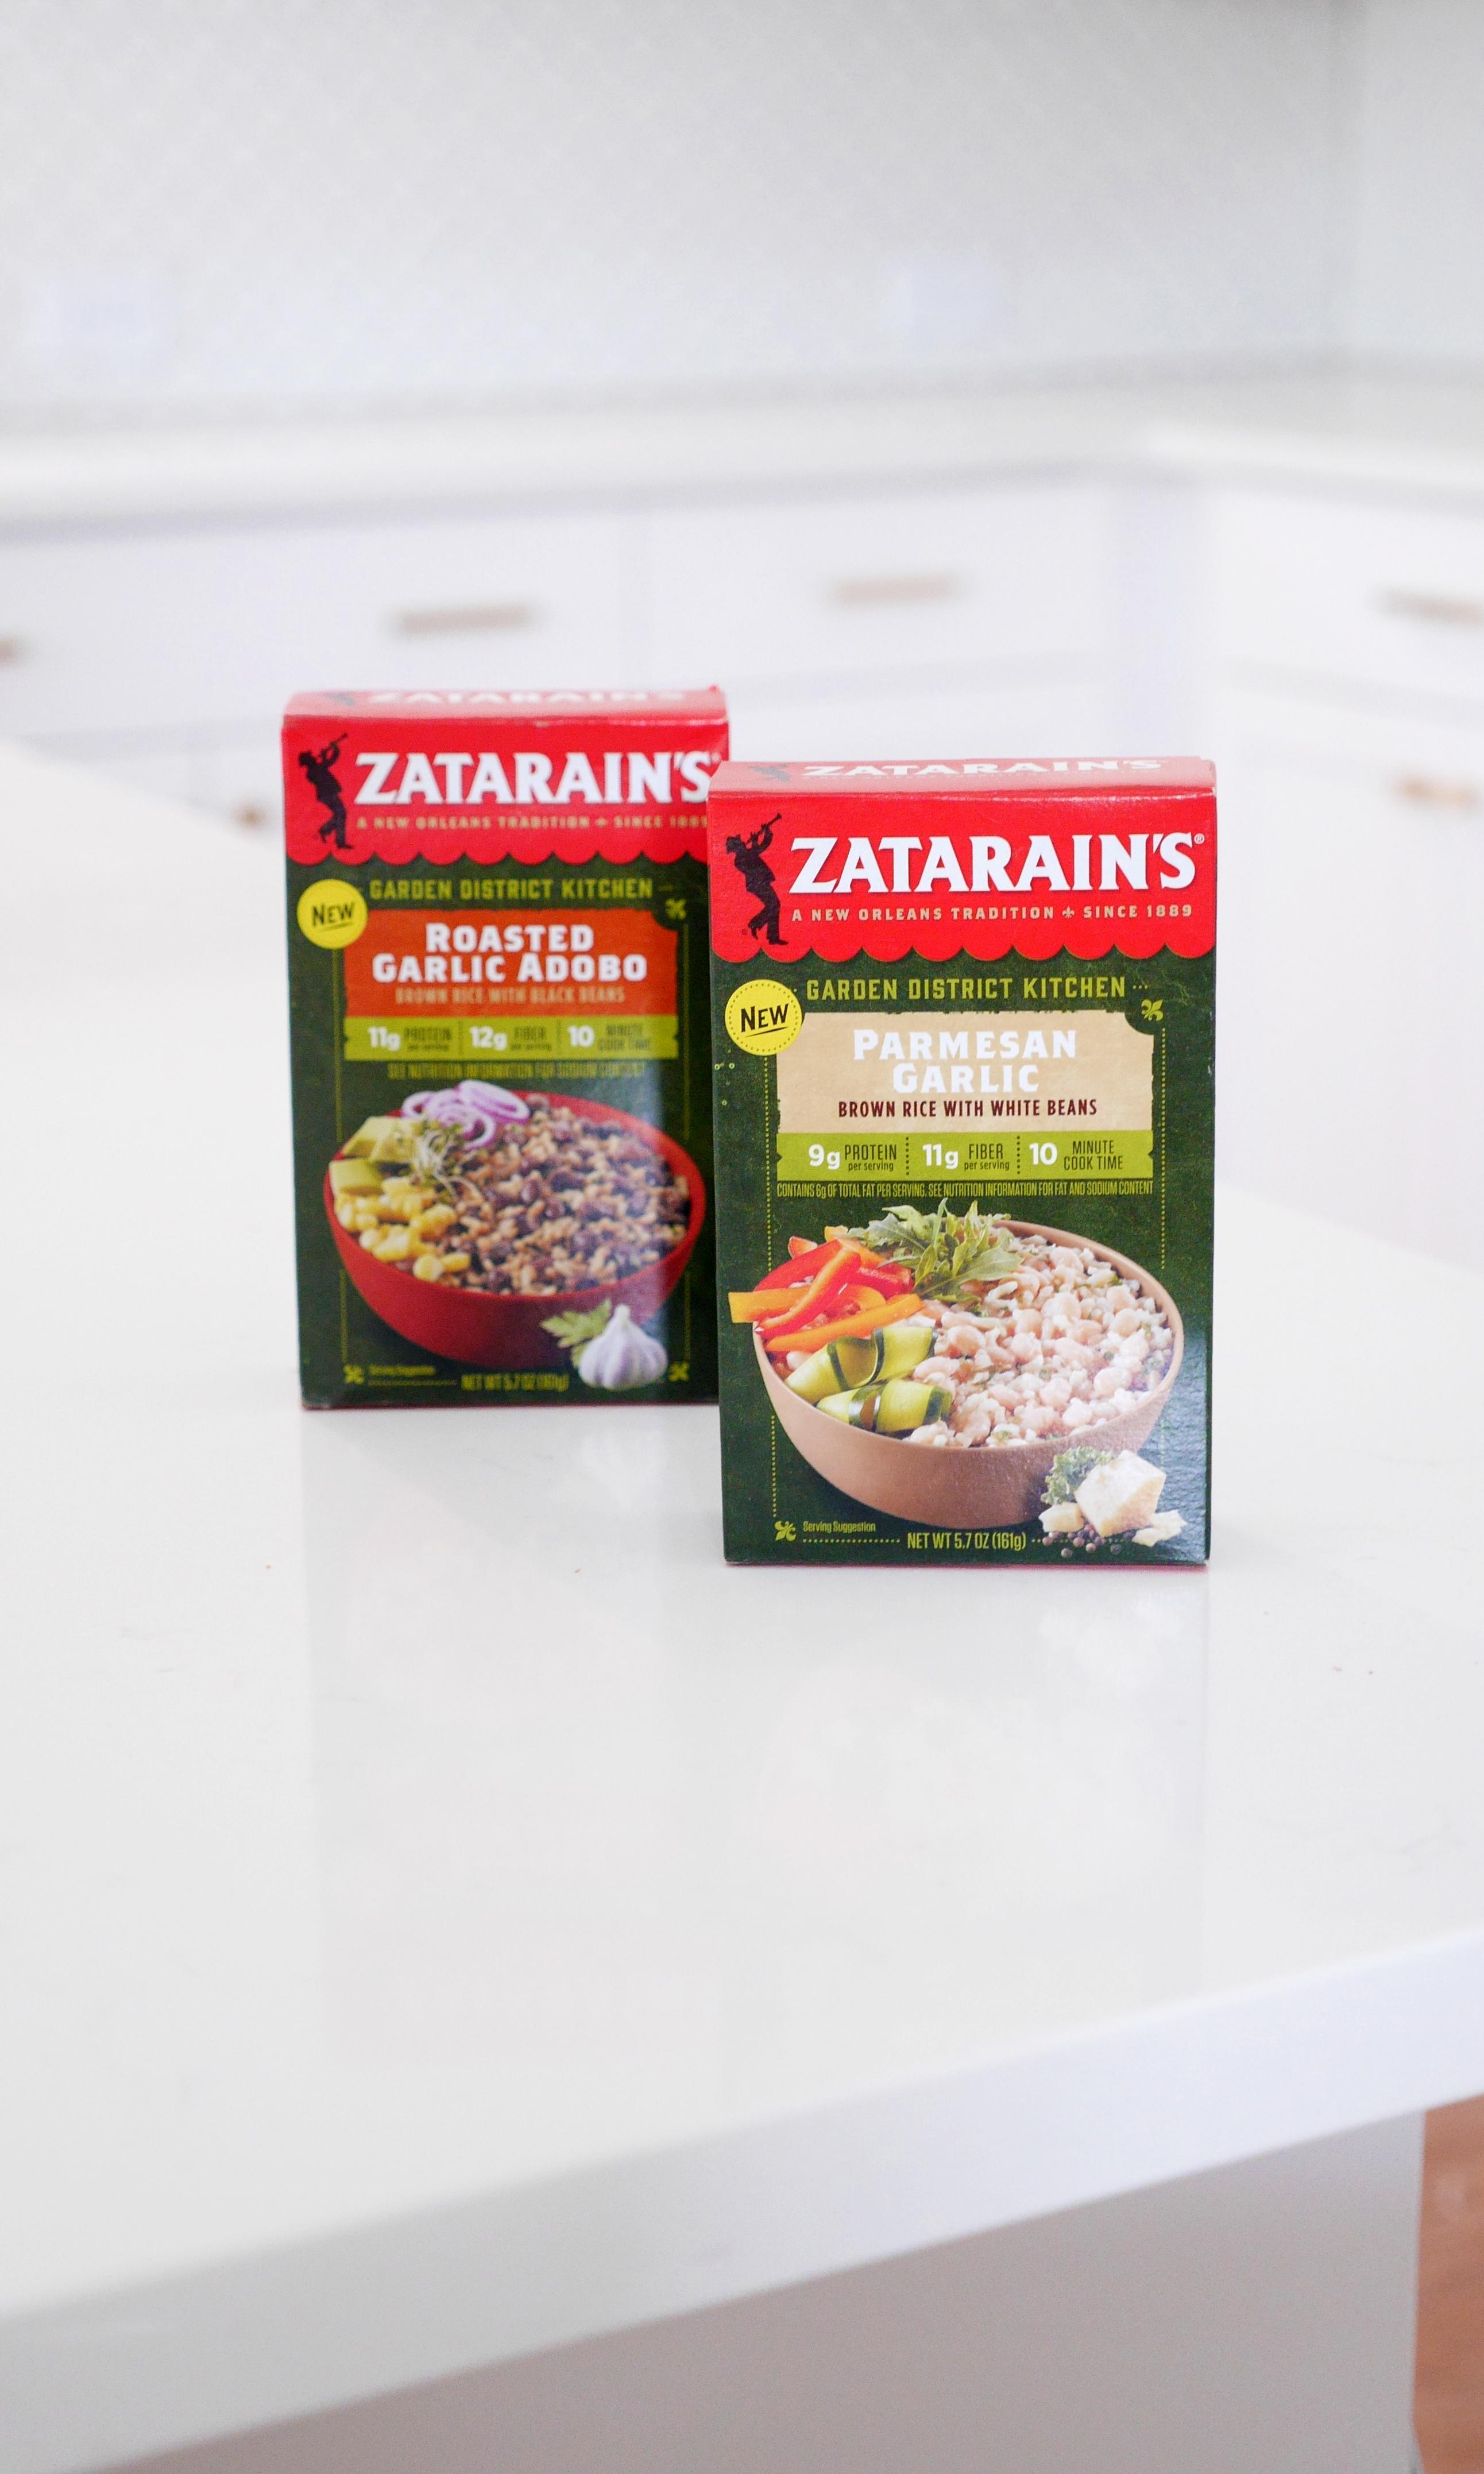 Zatarain's Parmesan Garlic Brown Rice with White Beans